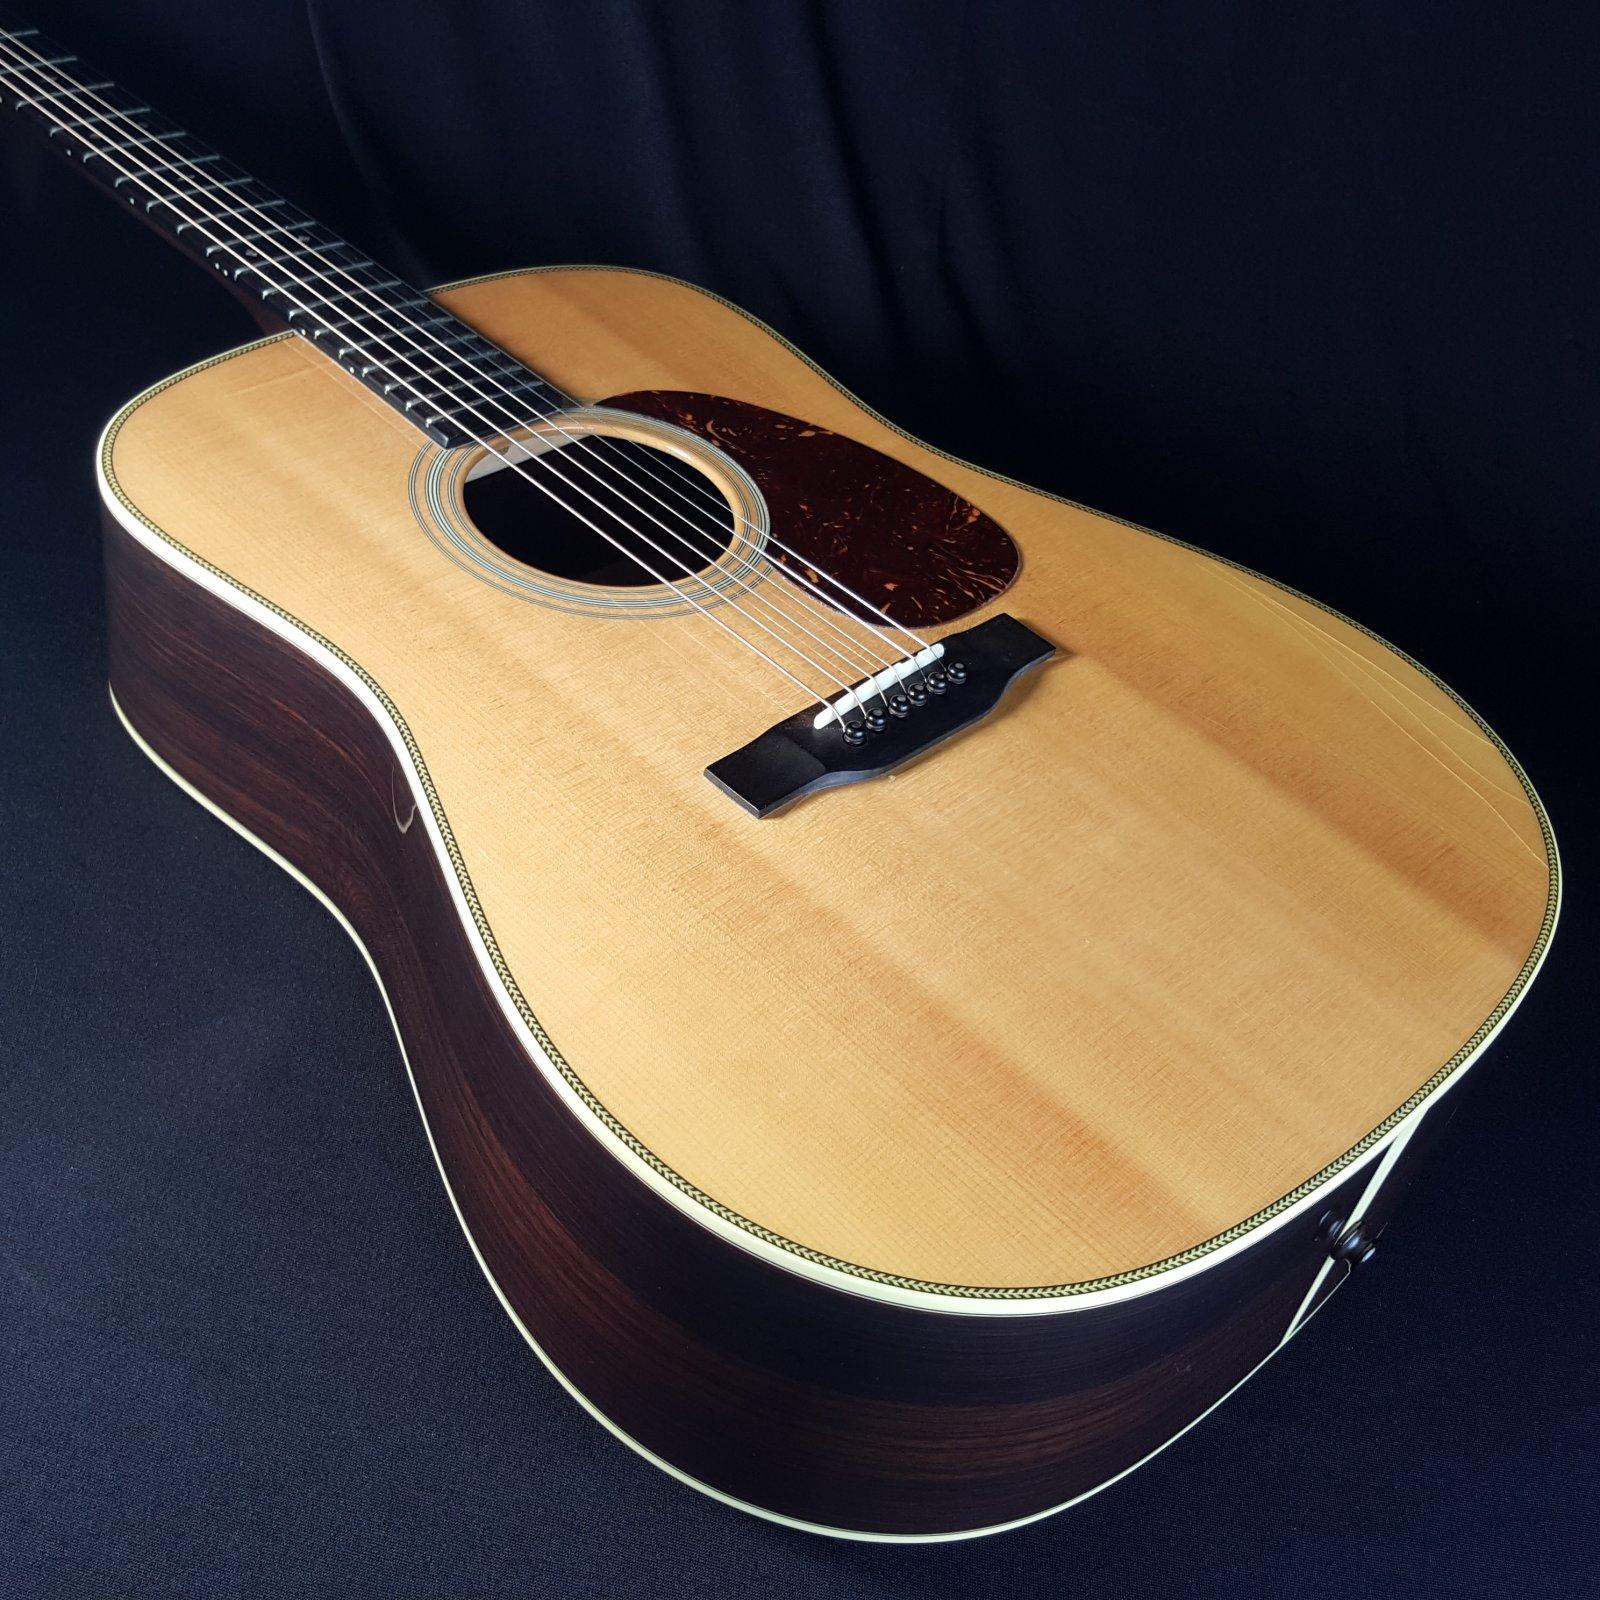 Used Eastman E8D Dreadnought Acoustic Guitar w/case